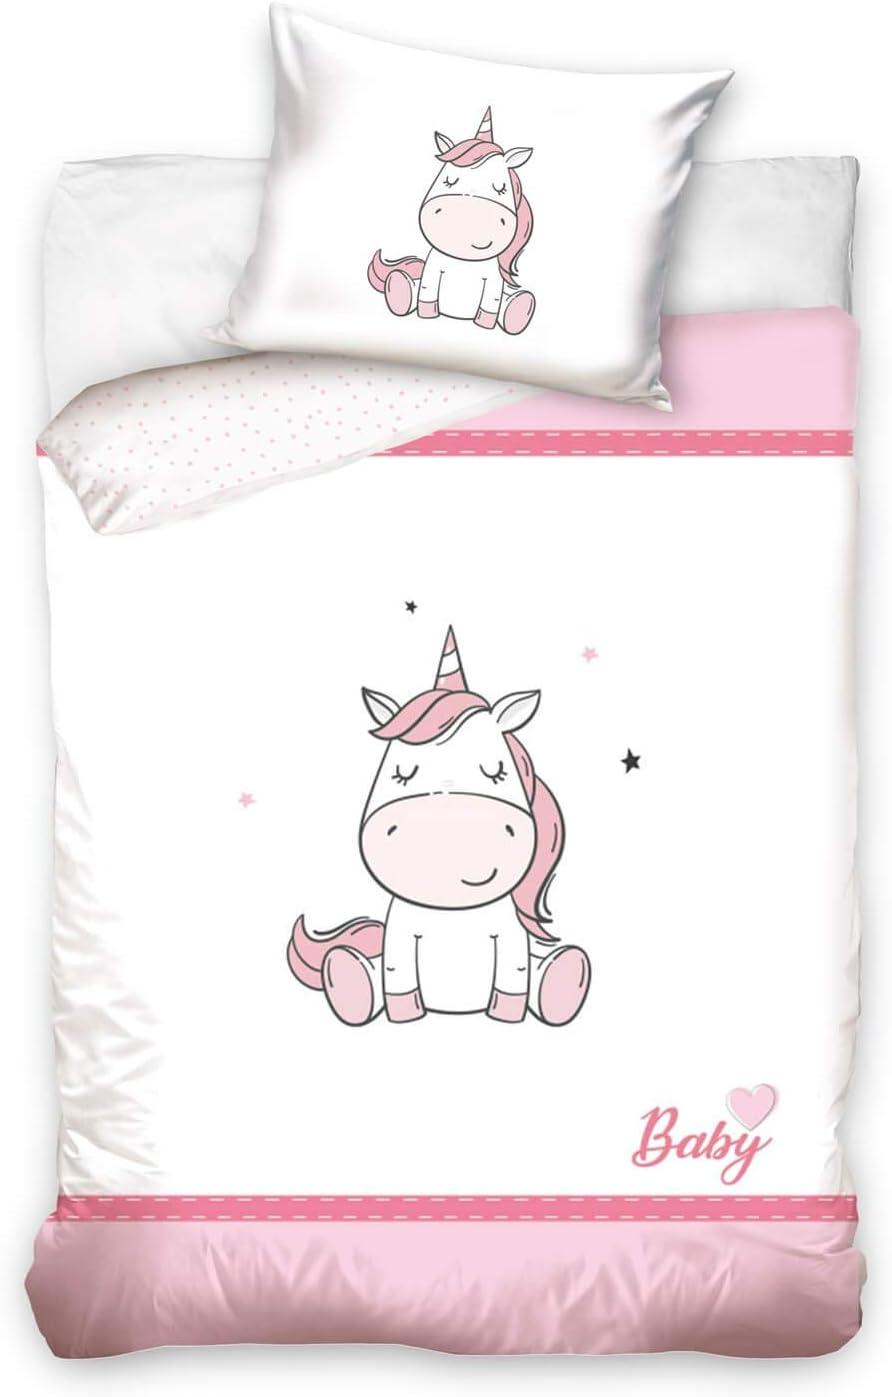 DHestia - Juego de Funda Nórdica 100% Algodón Natural para Cuna de Bebé Unicornio Baby1910017